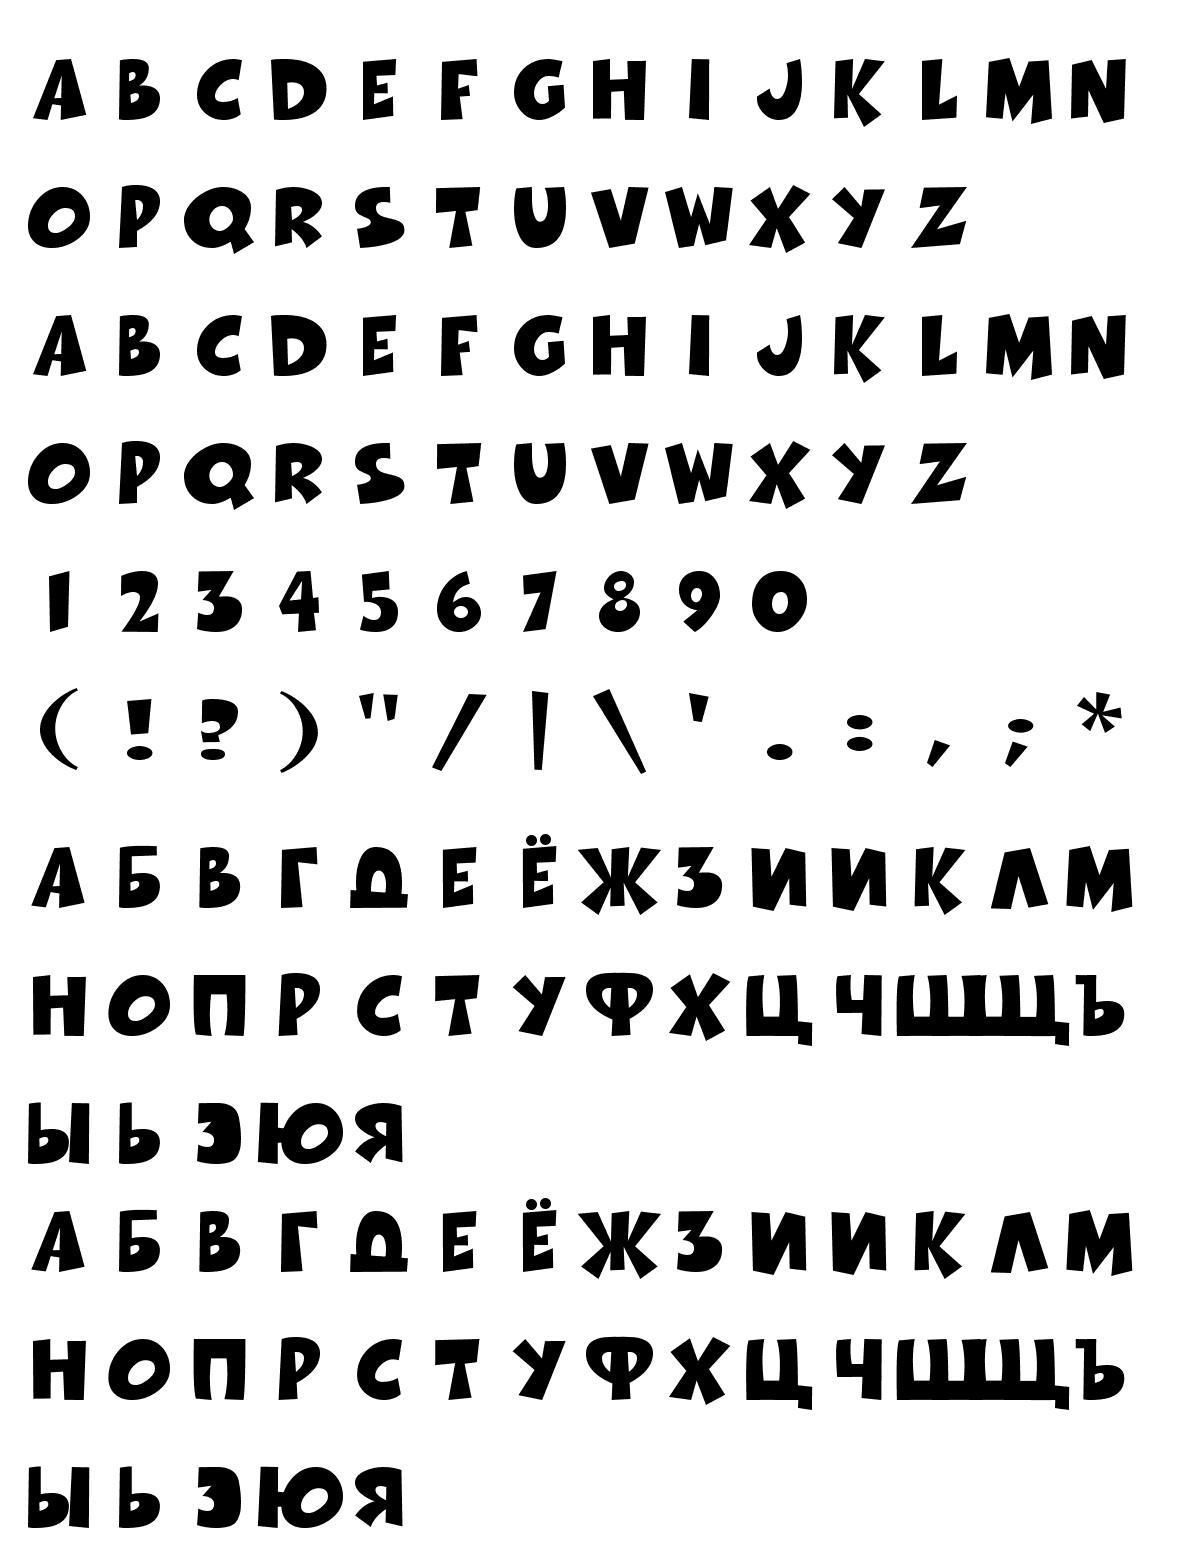 Шрифт Thwack-Cyrillic